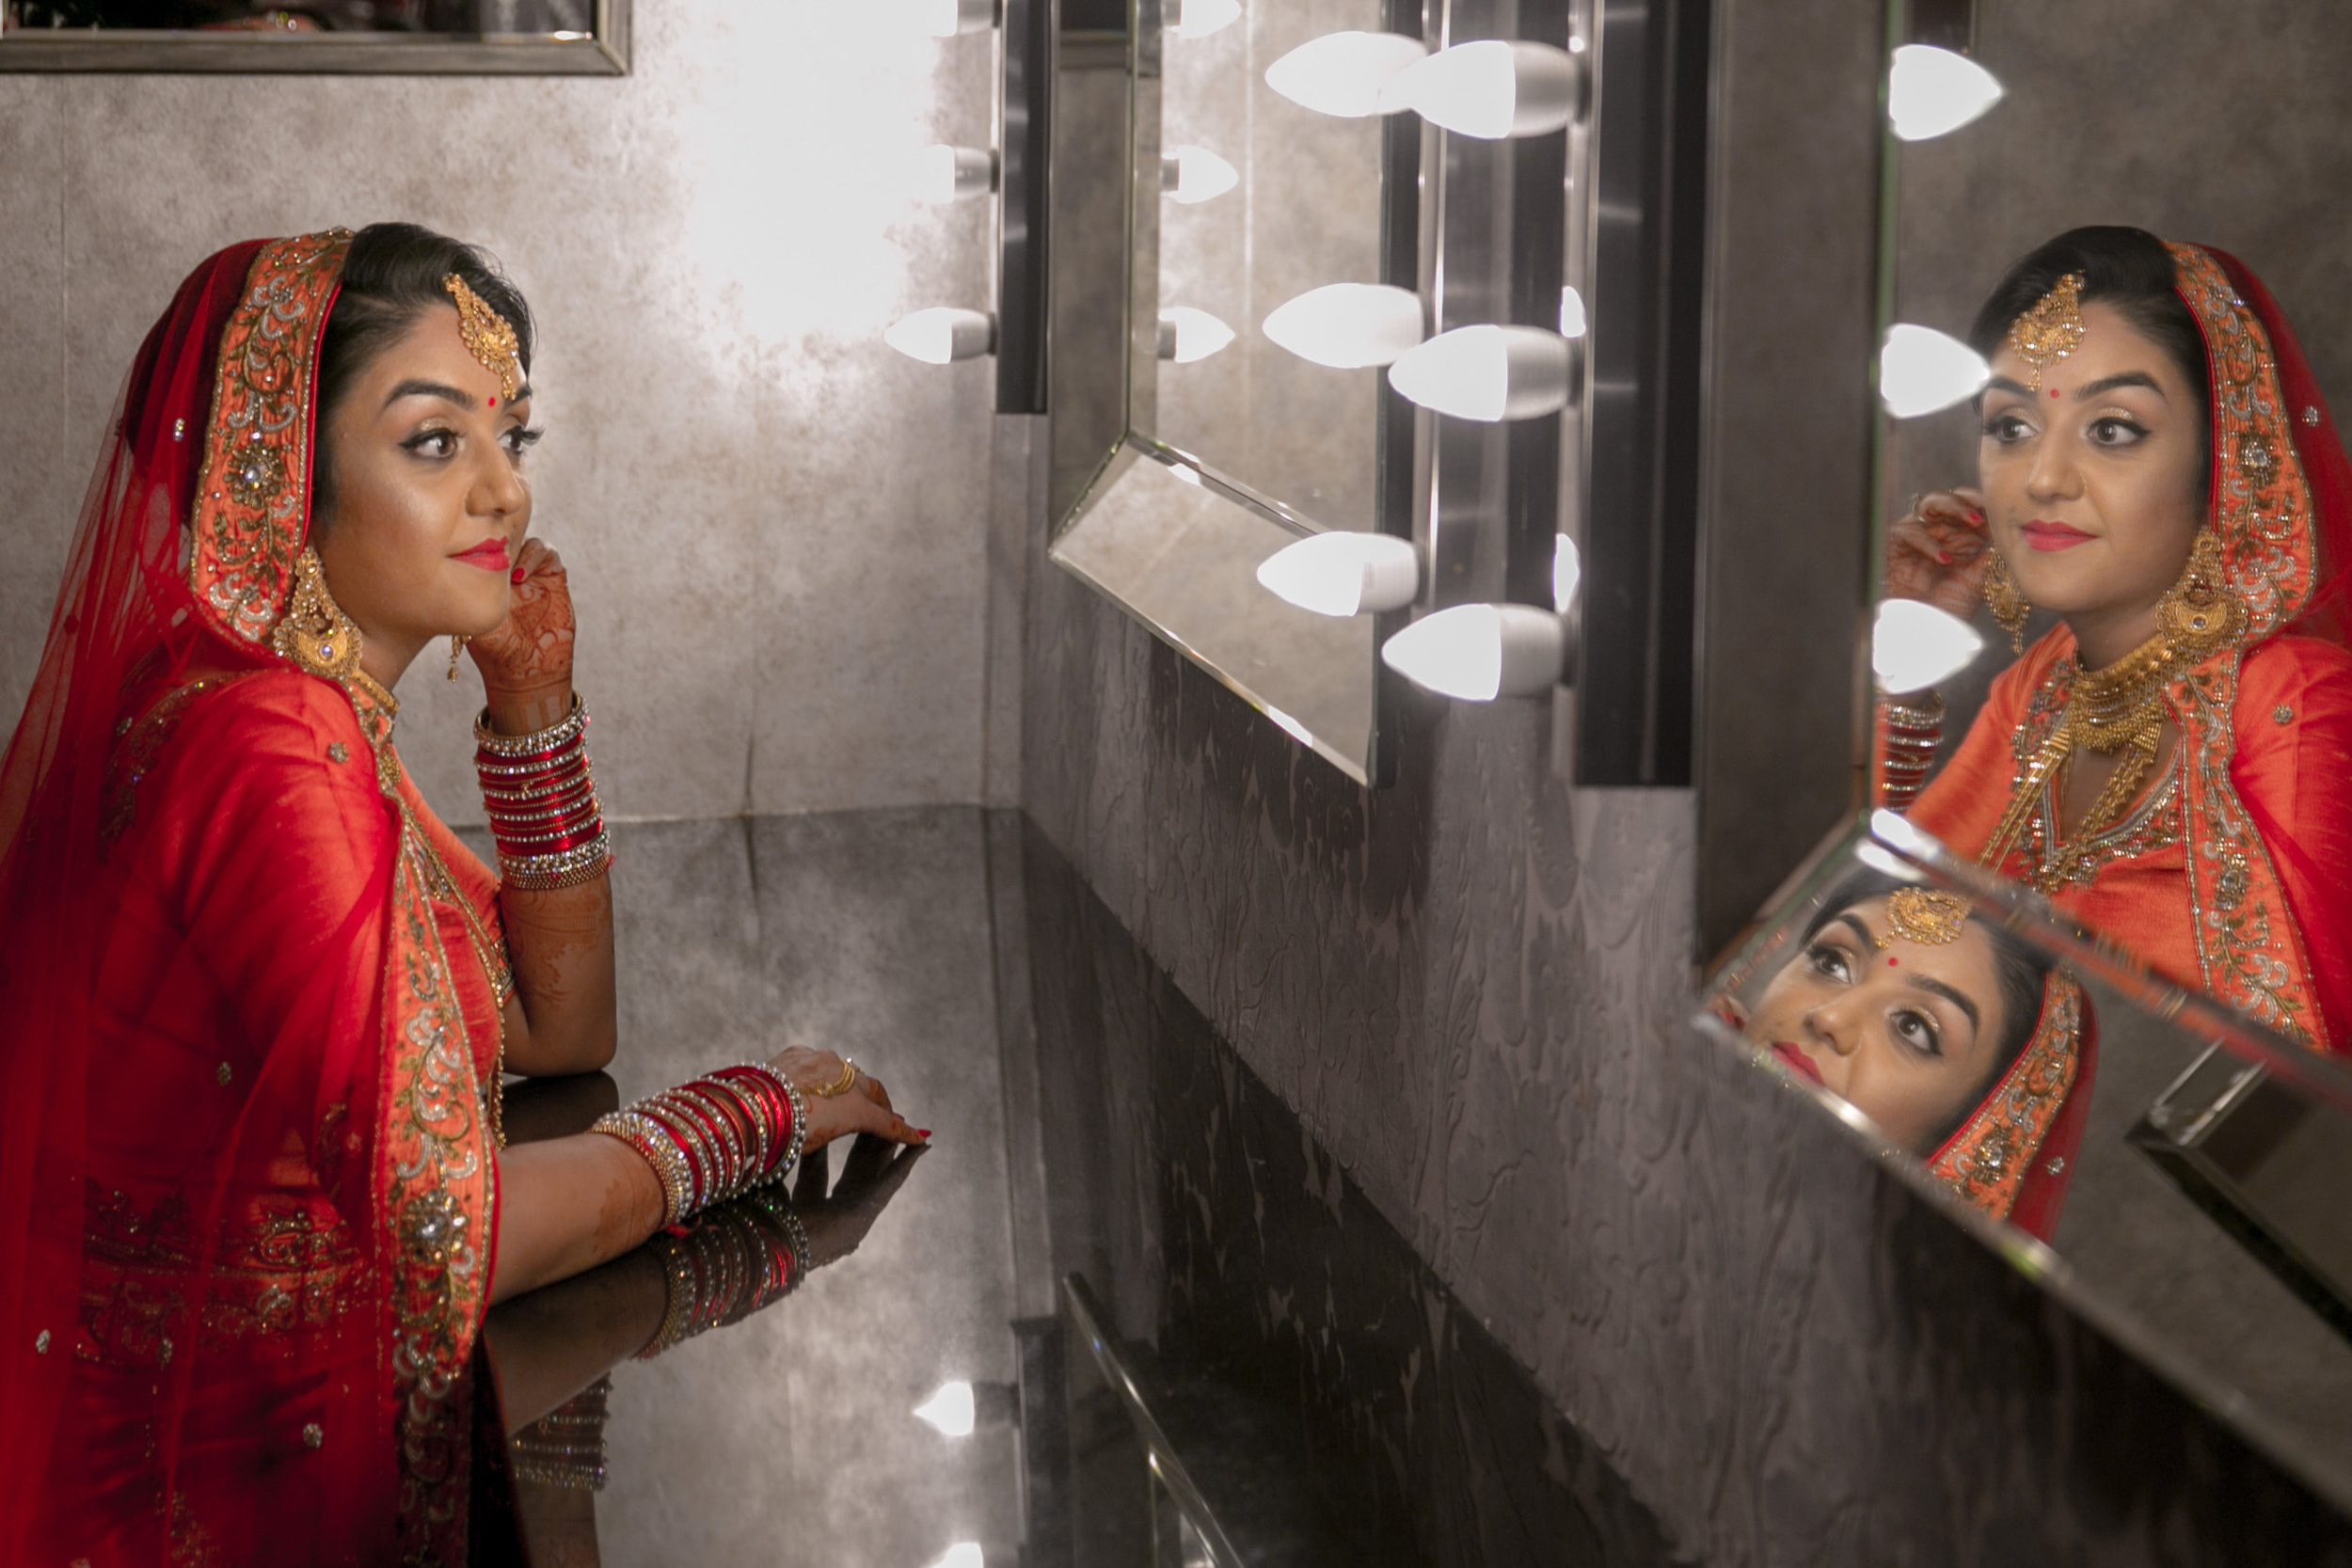 premier-banquetting-london-Hindu-asian-wedding-photographer-natalia-smith-photography-5.jpg